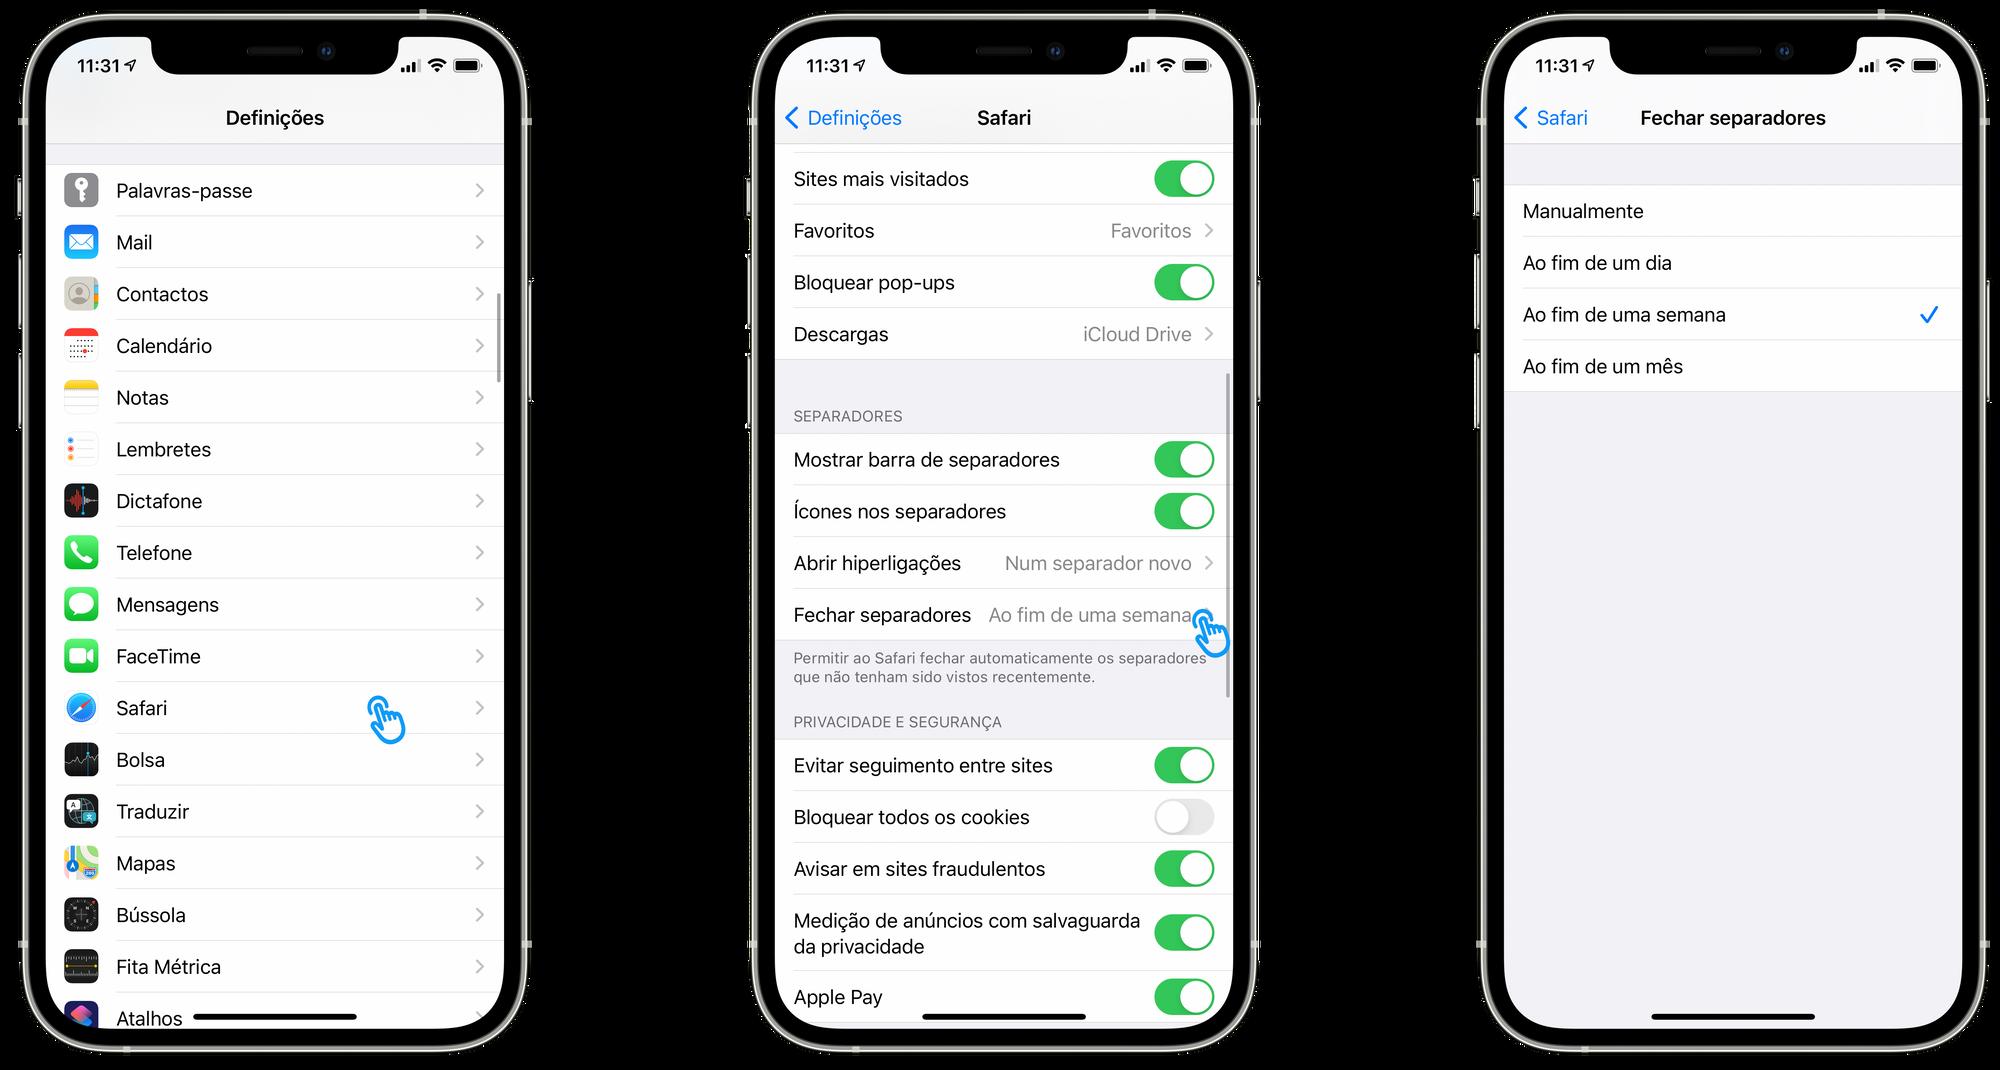 Fechar separadores automaticamente no Safari